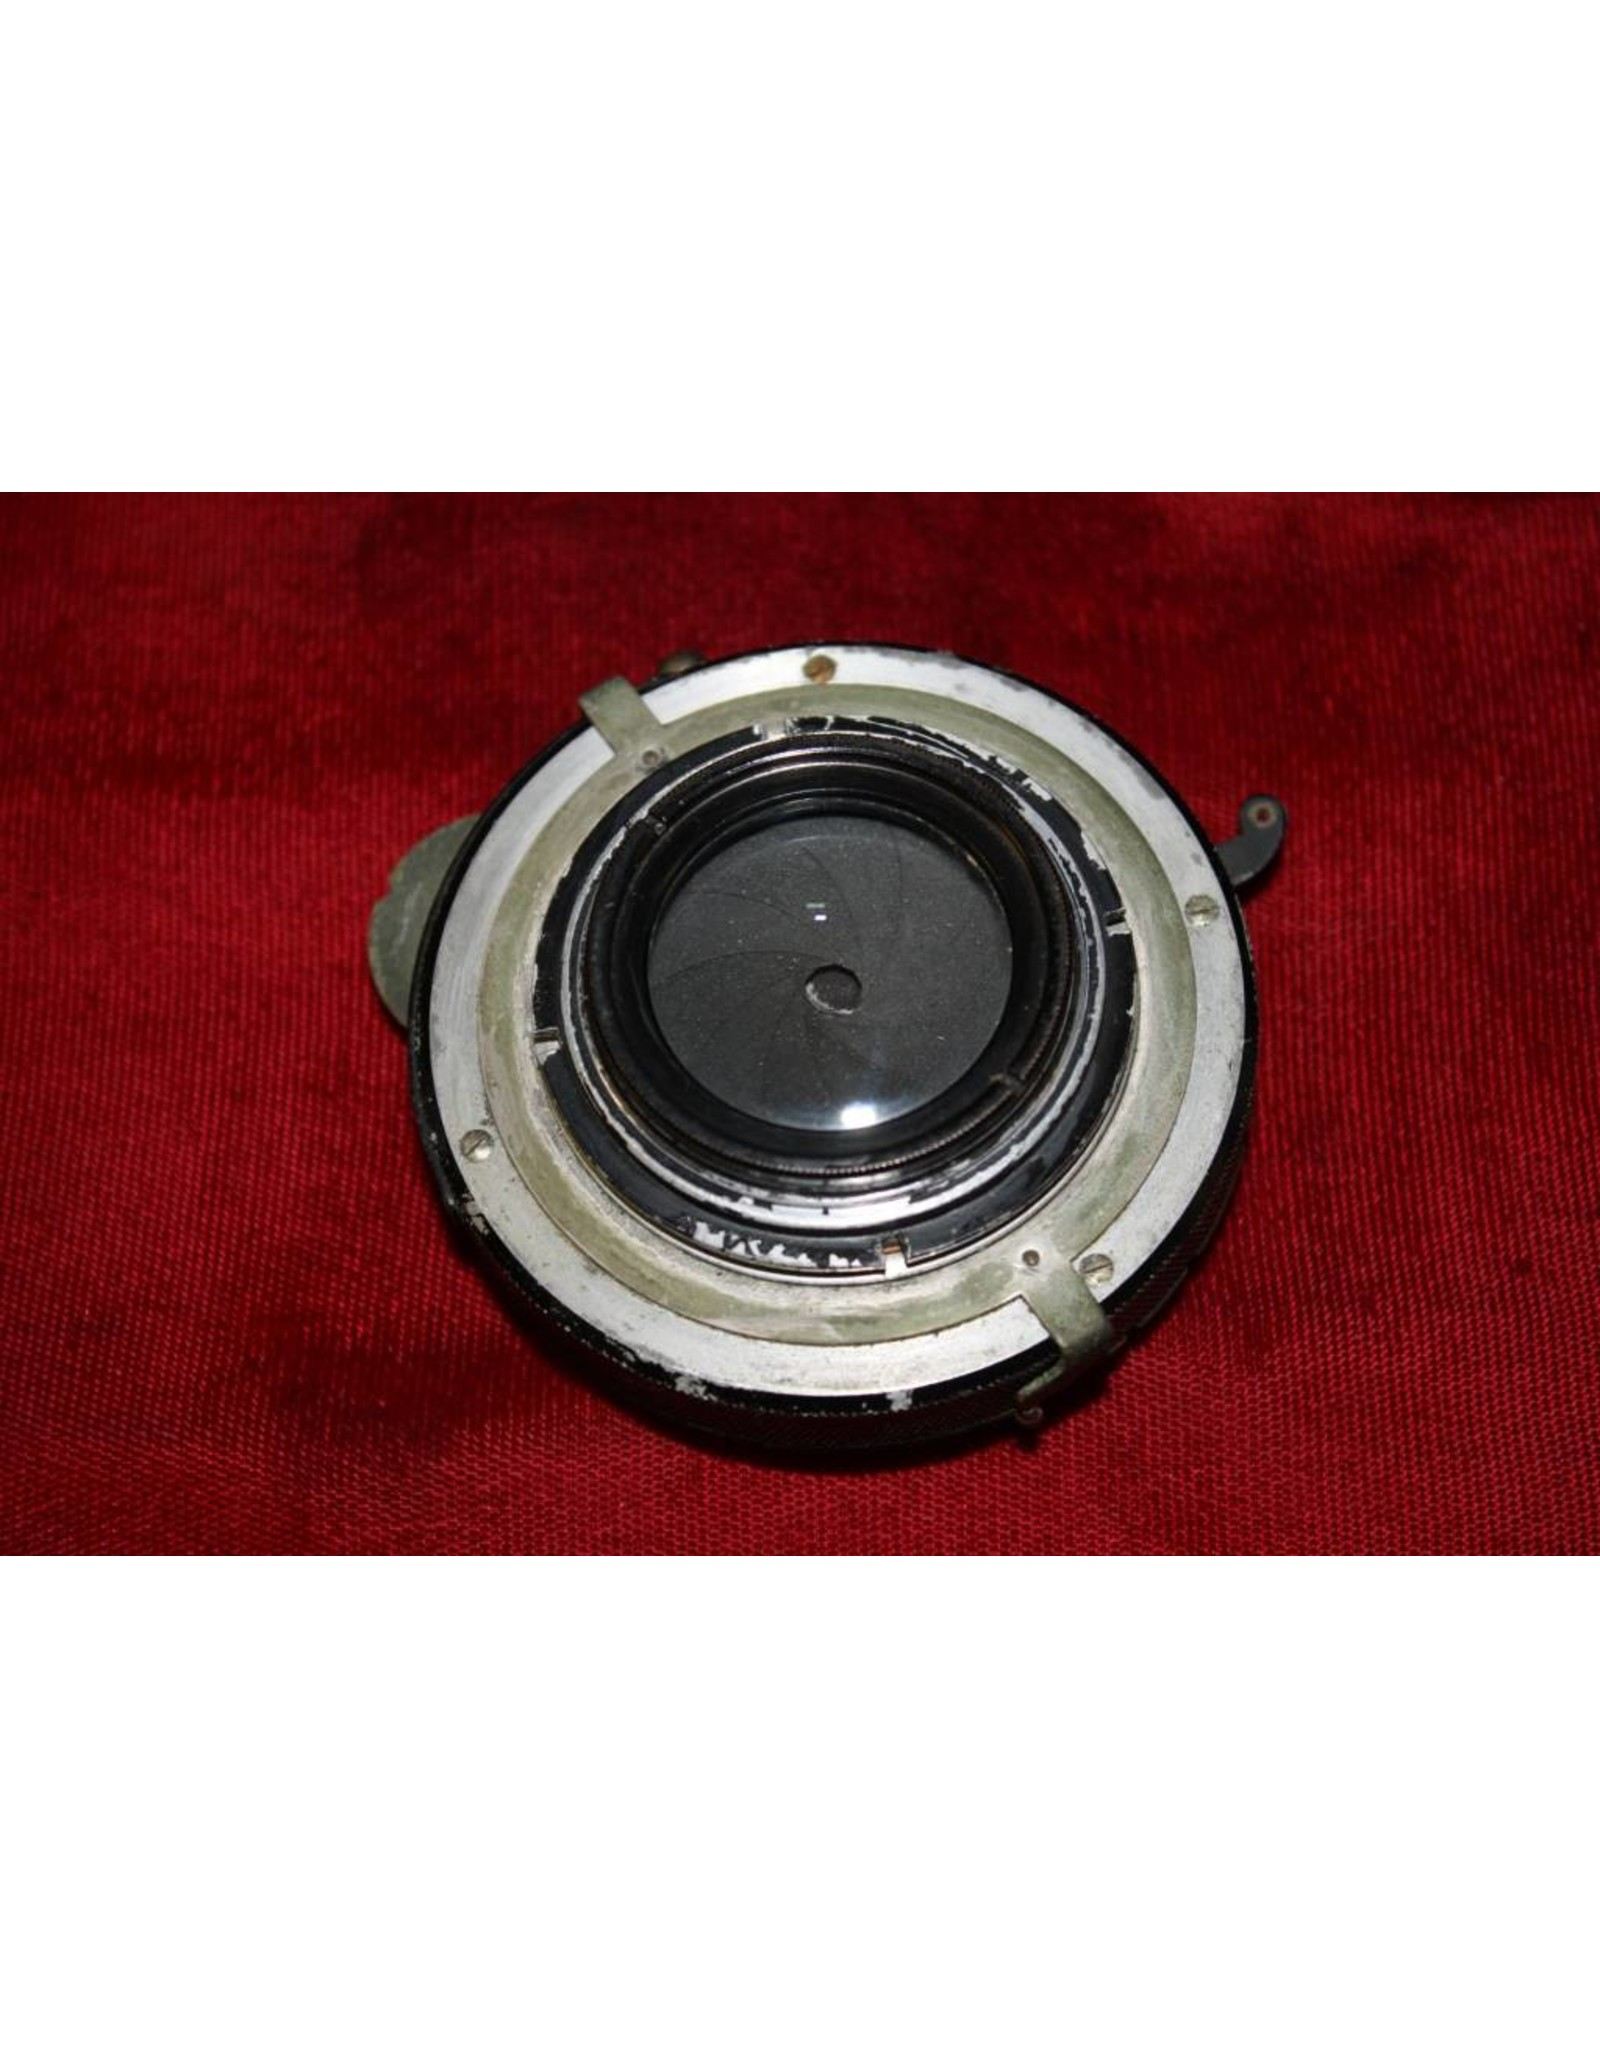 Carl Zeiss Jena Tessar 13.5cm f/4.5 Large Format Lens 4x5